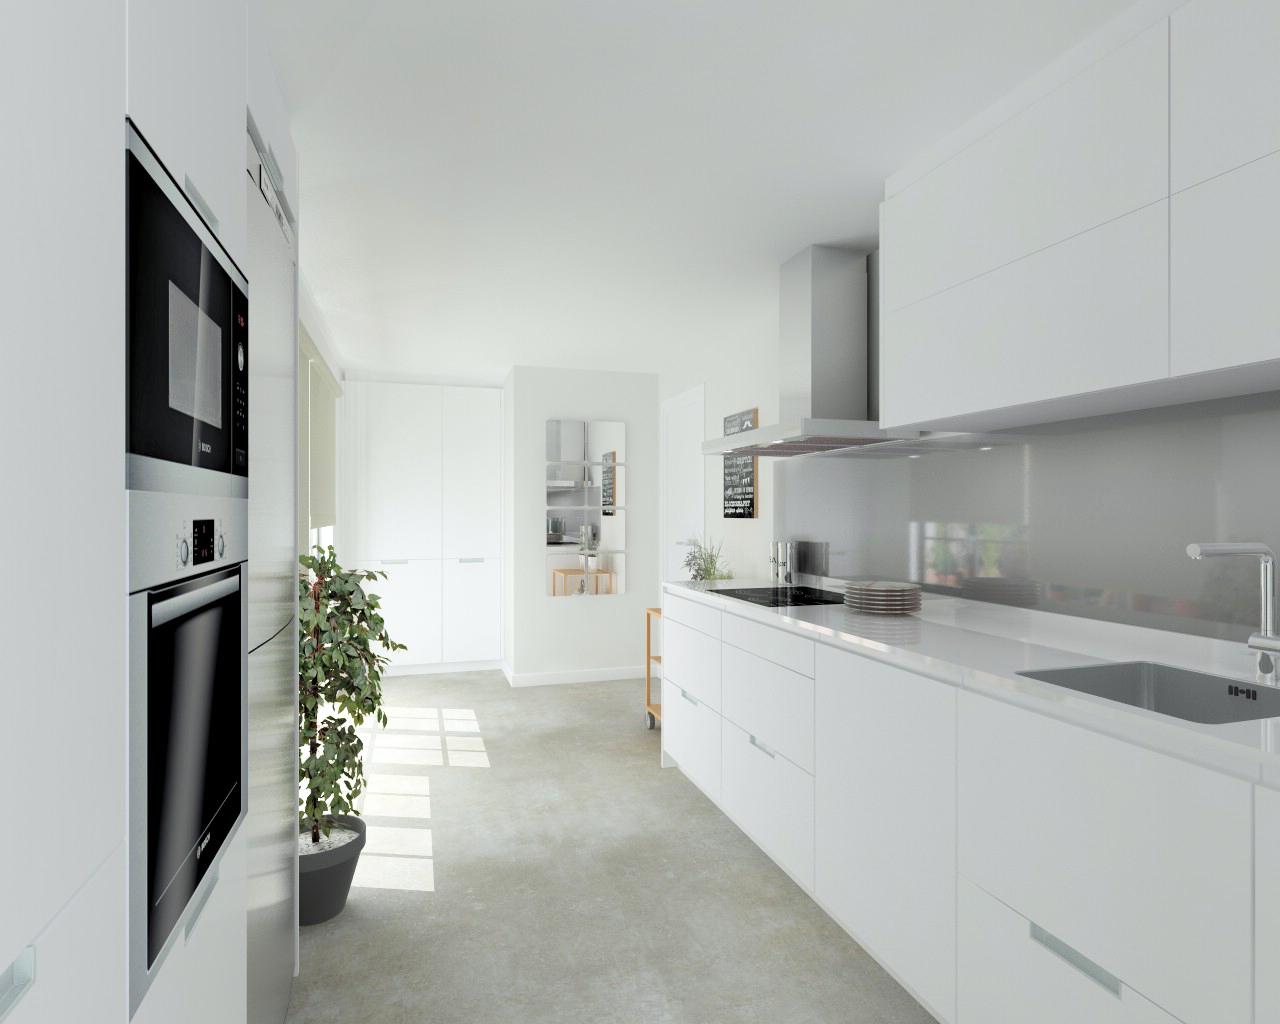 Imagen1 estudio cocinas dc for Cocinas blancas con silestone